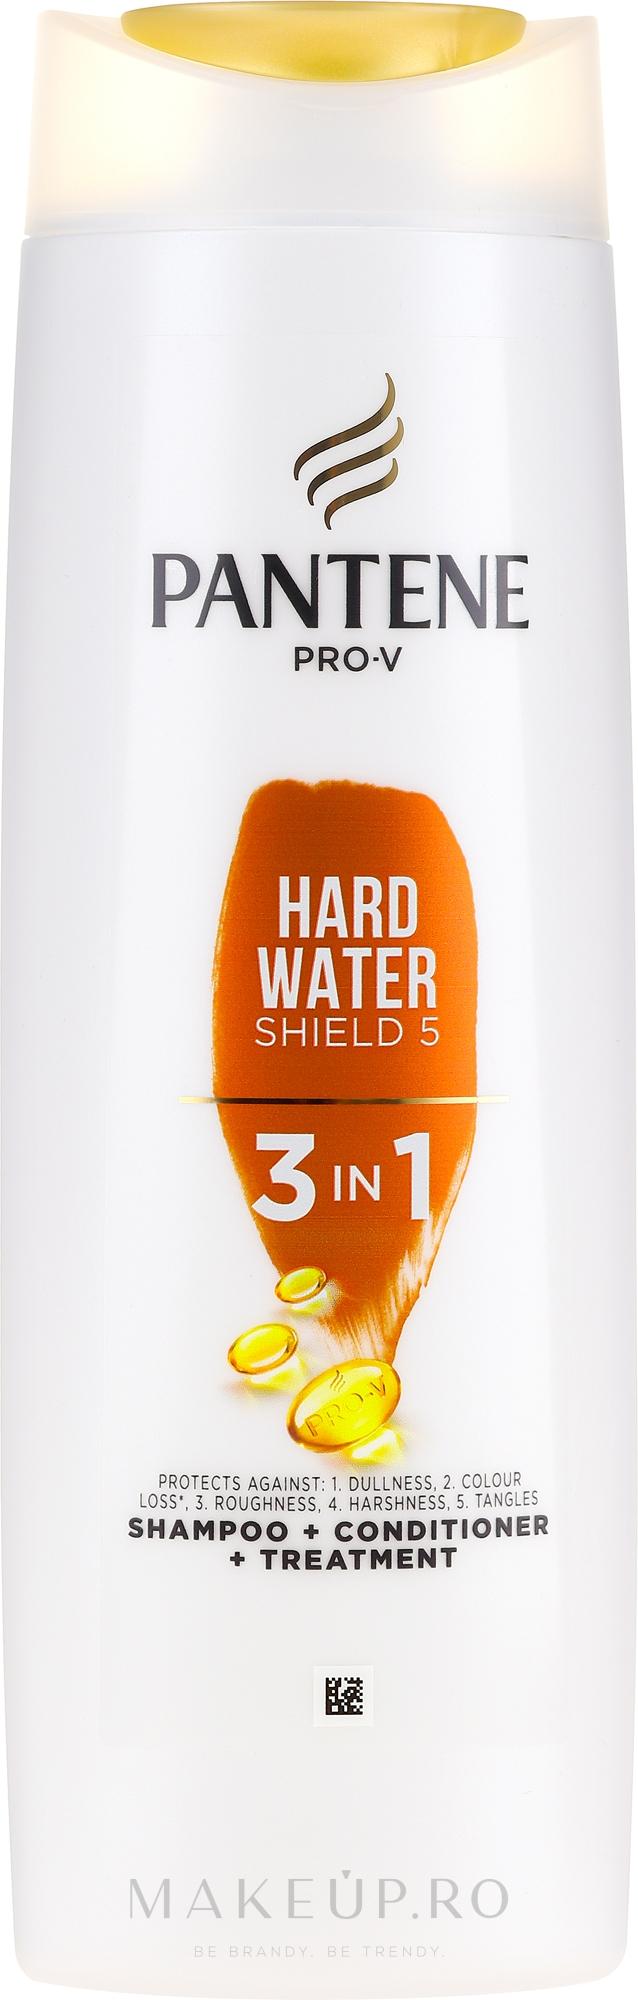 Șampon- balsam de păr - Pantene Pro-V Hard Water Shield 5 3in1 Shampoo — Imagine 360 ml